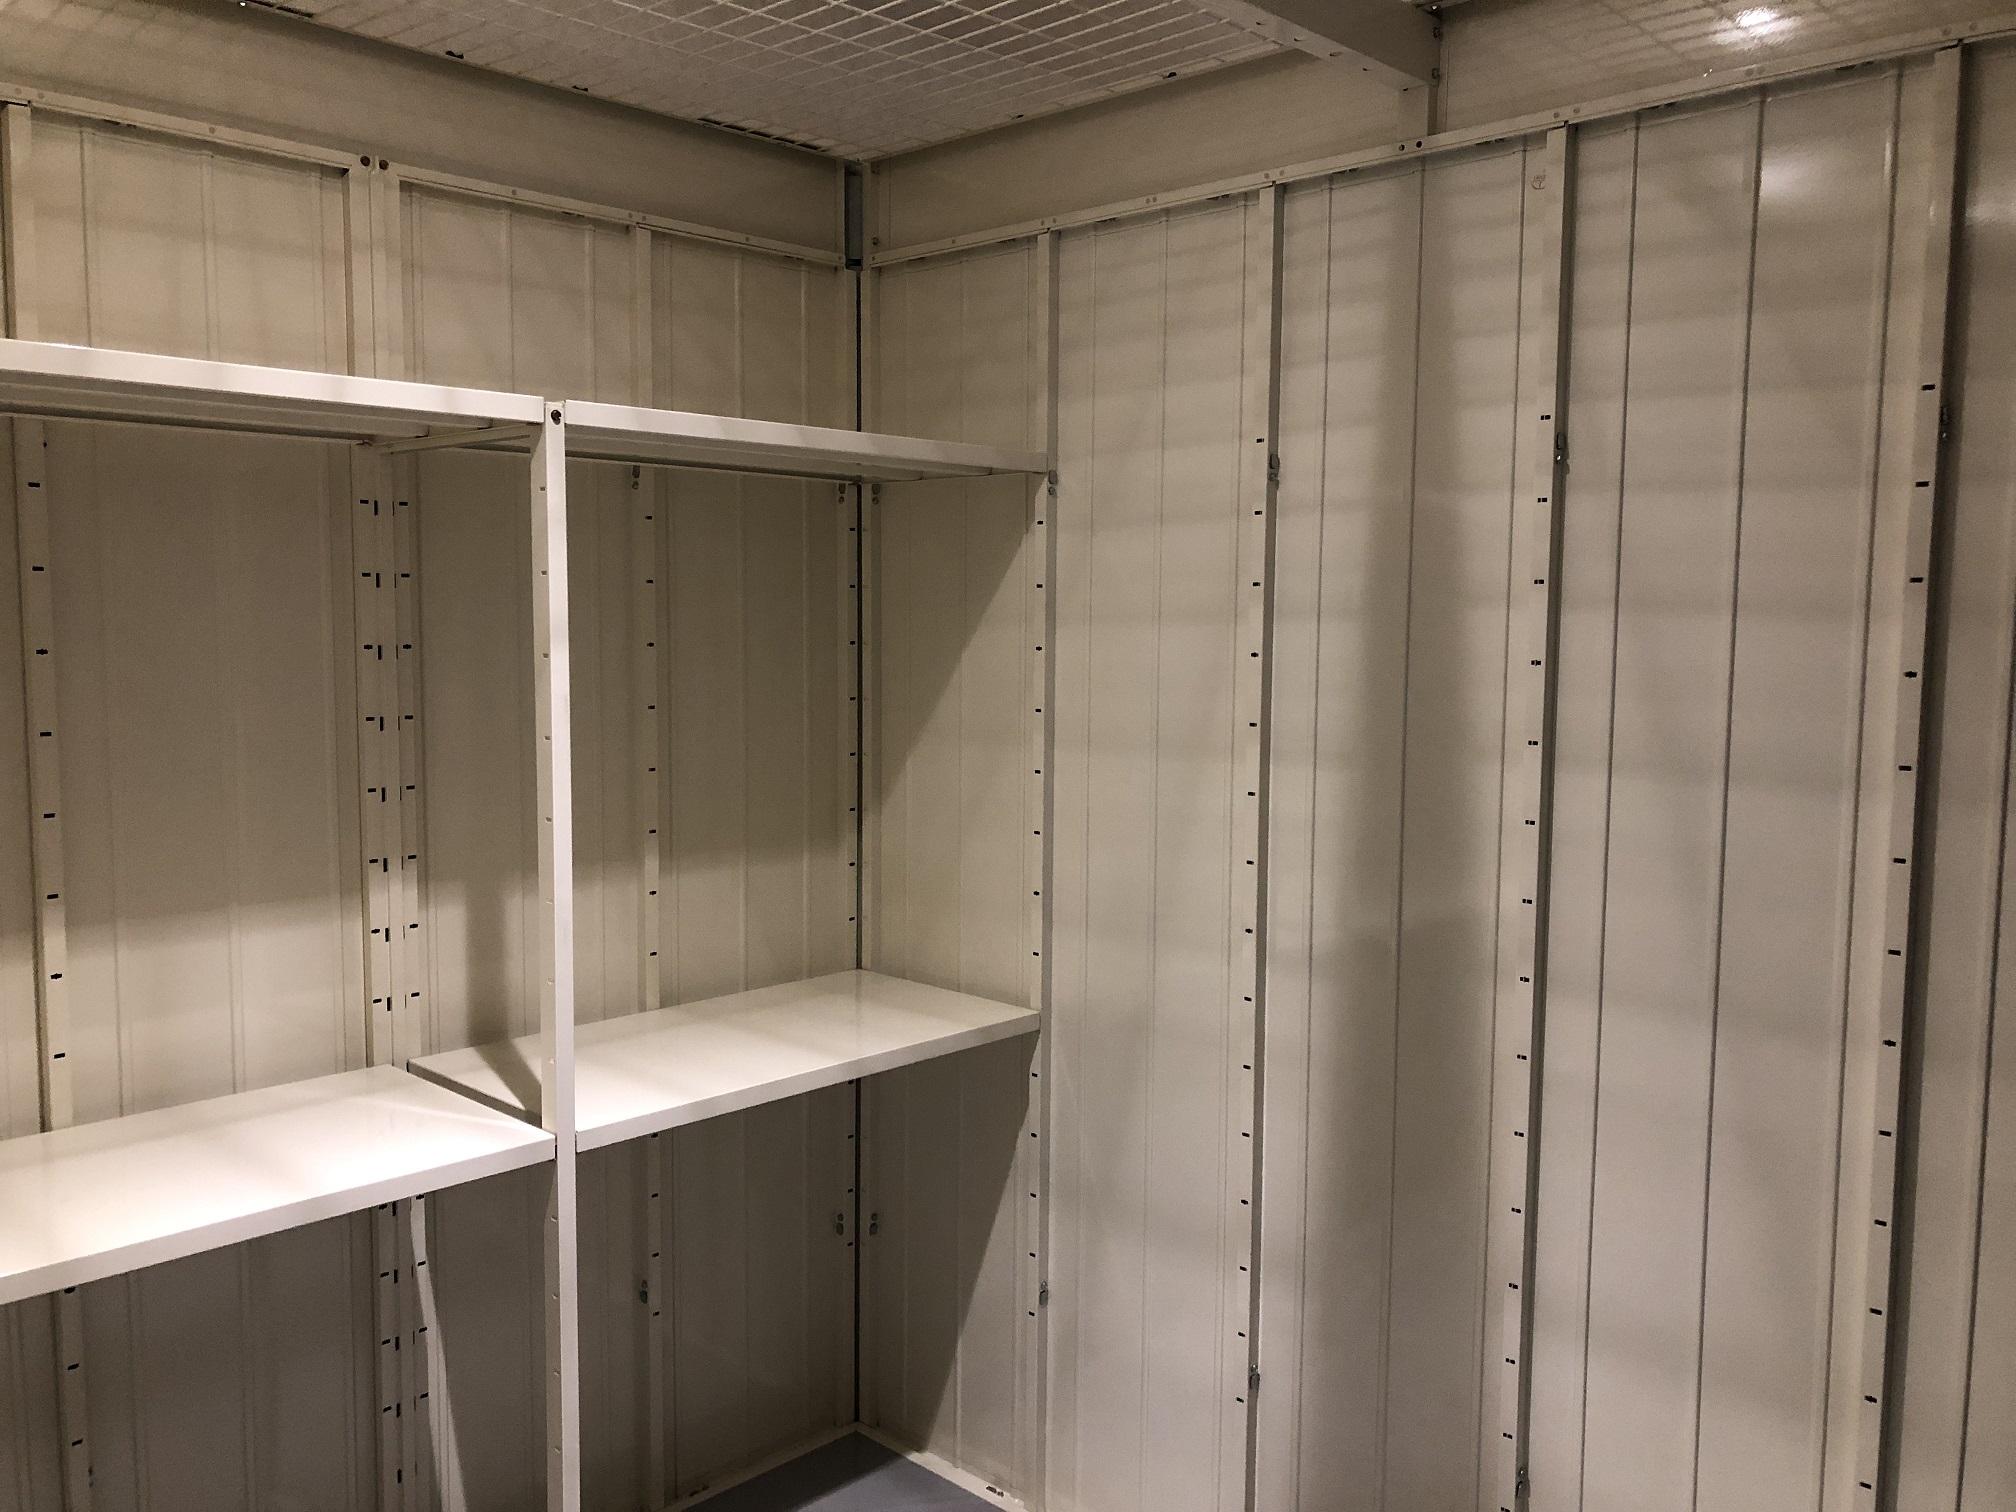 INABA96西保木間店 棚板は標準装備